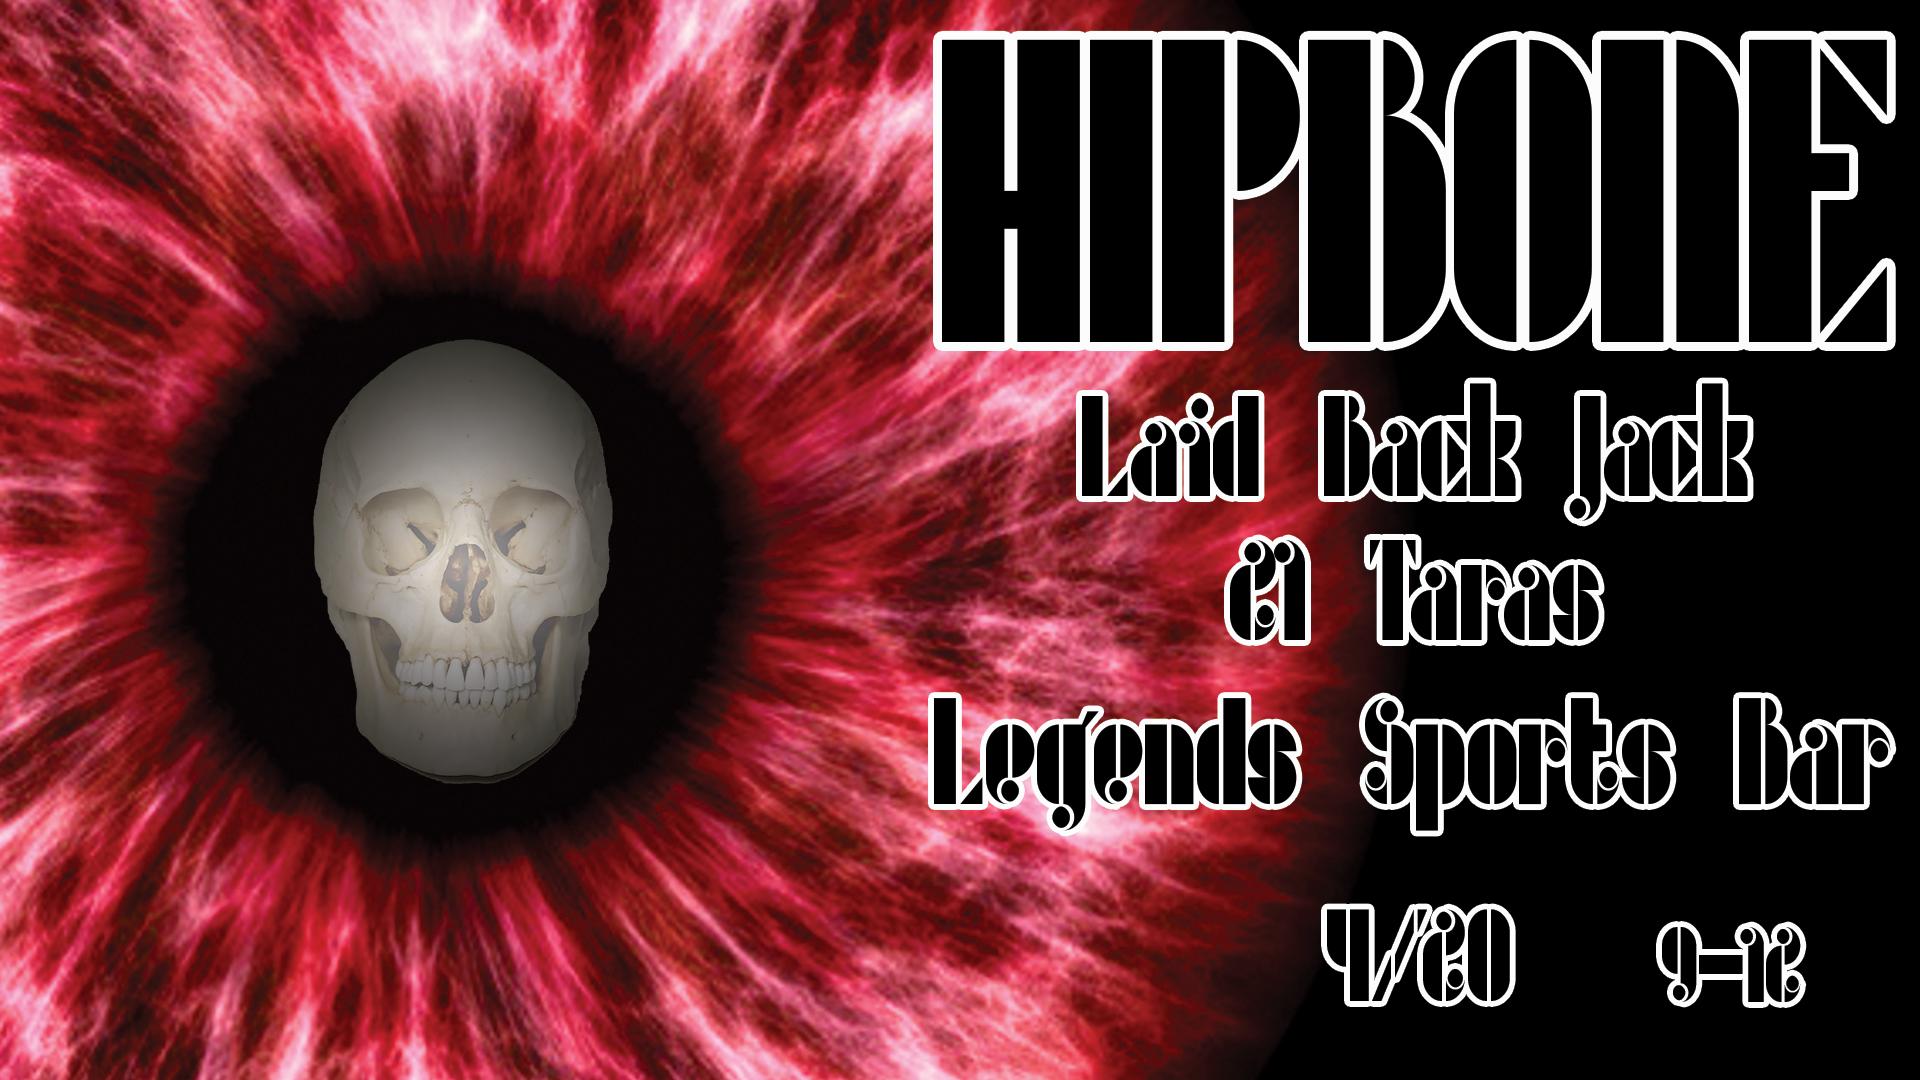 Hipbone 420 Facebook